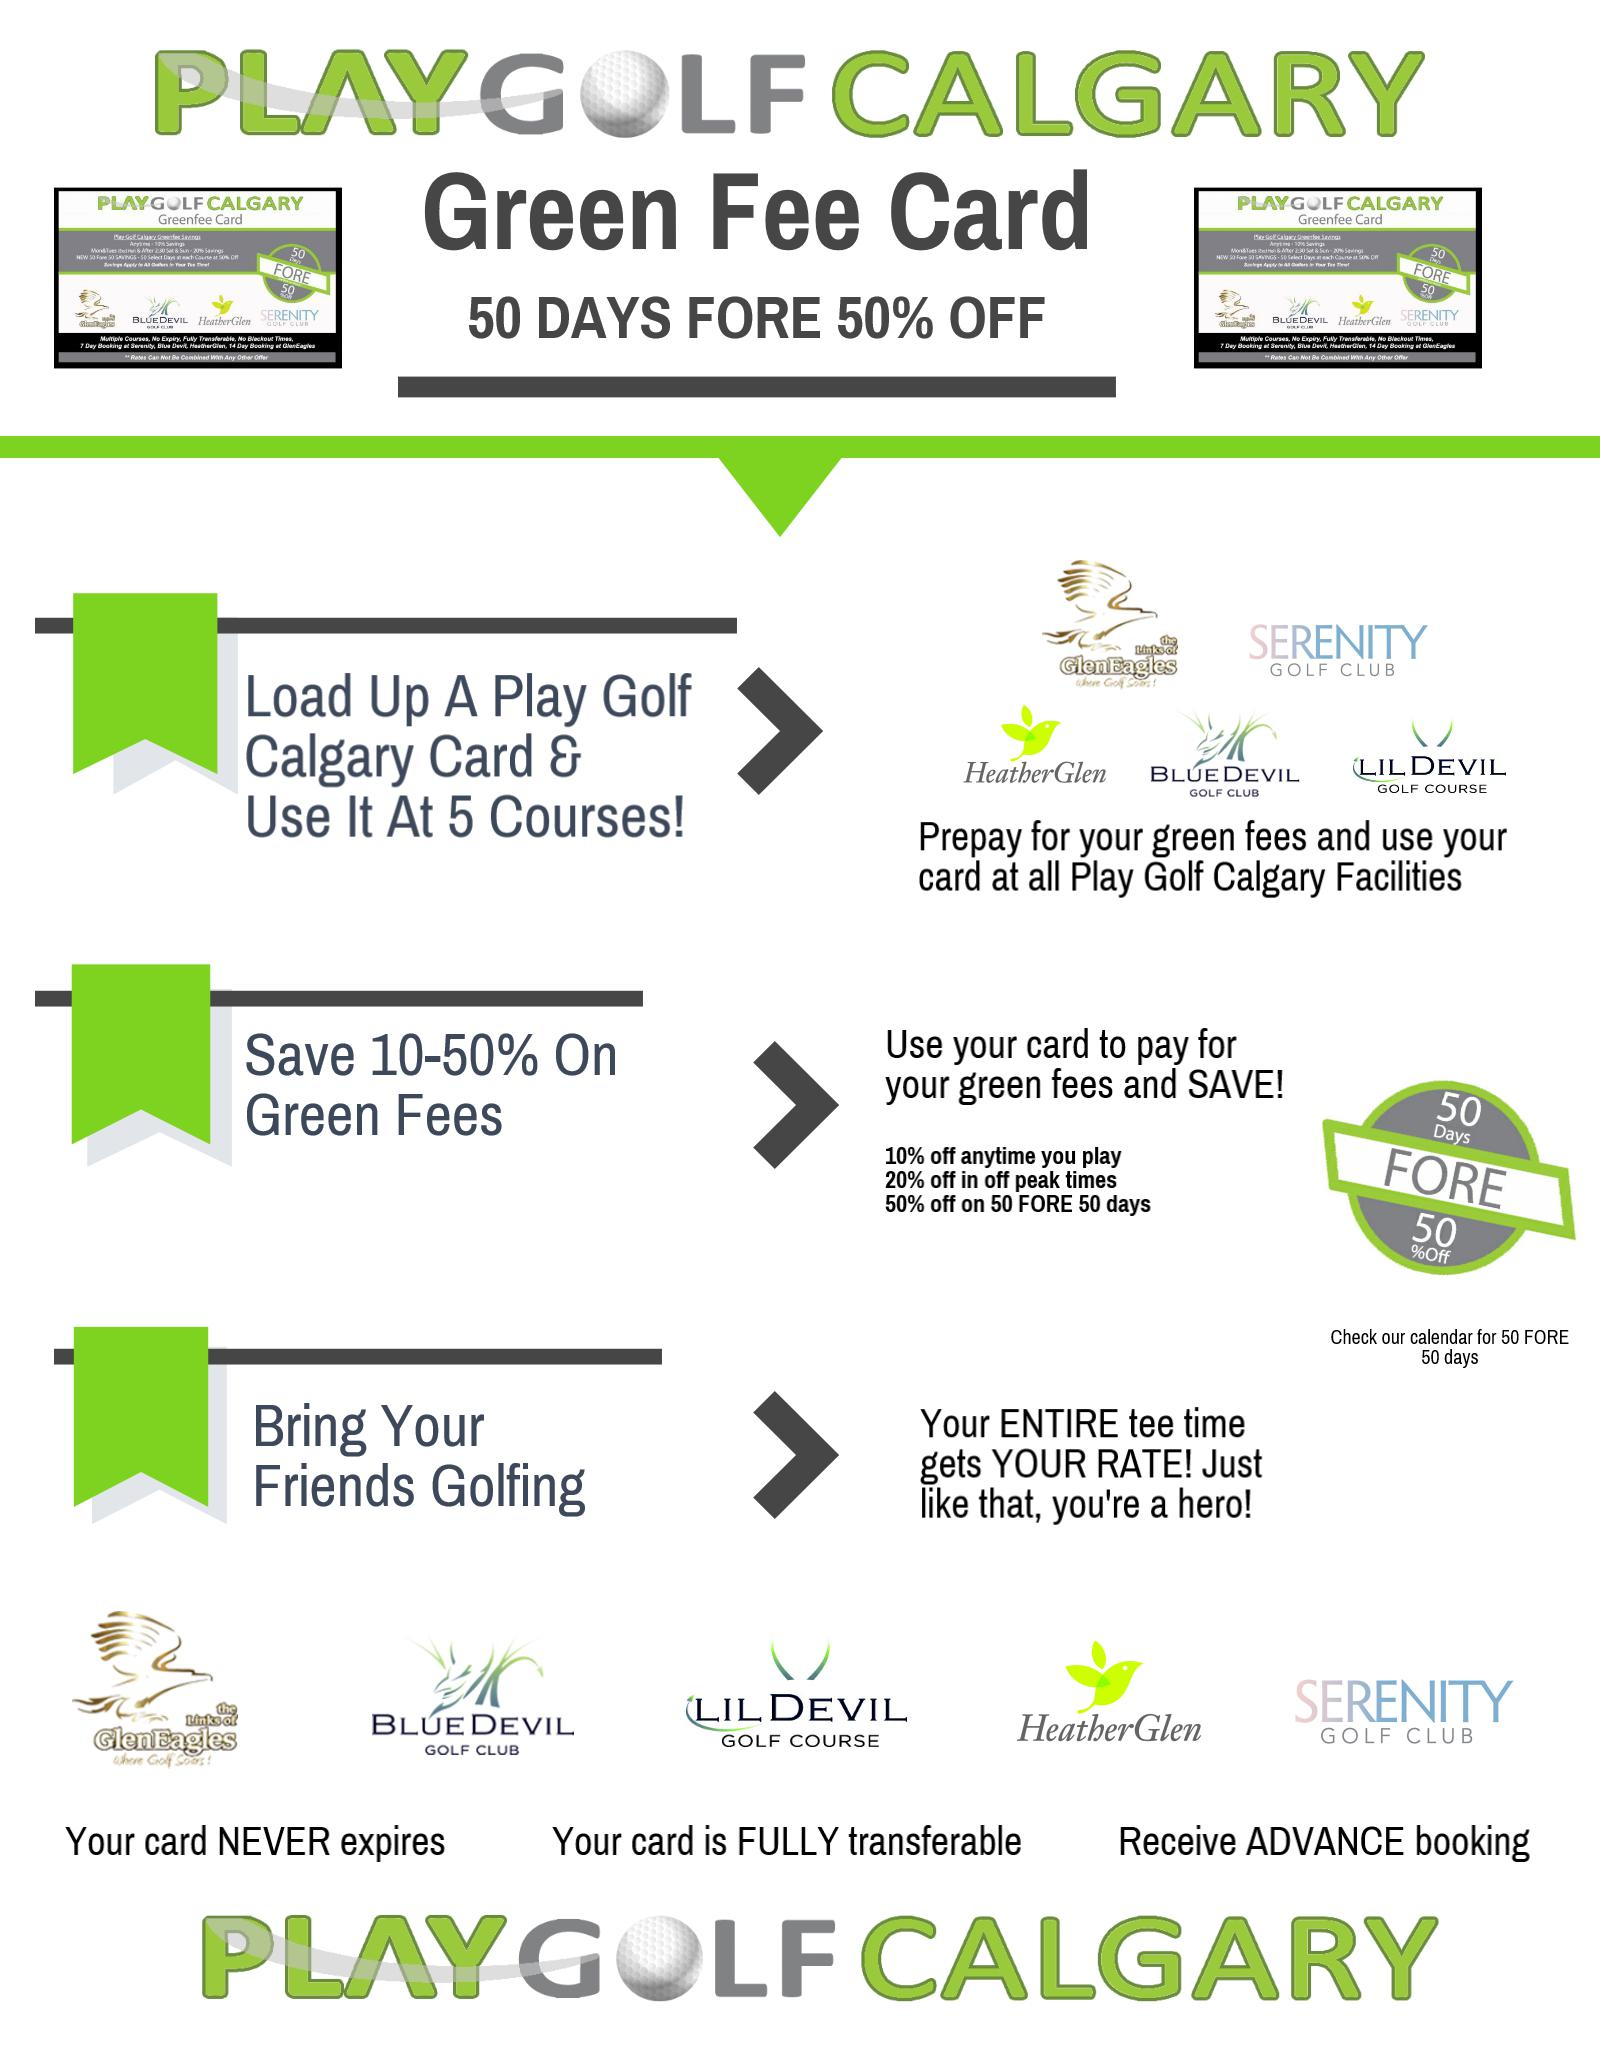 Greenfee Savings Card